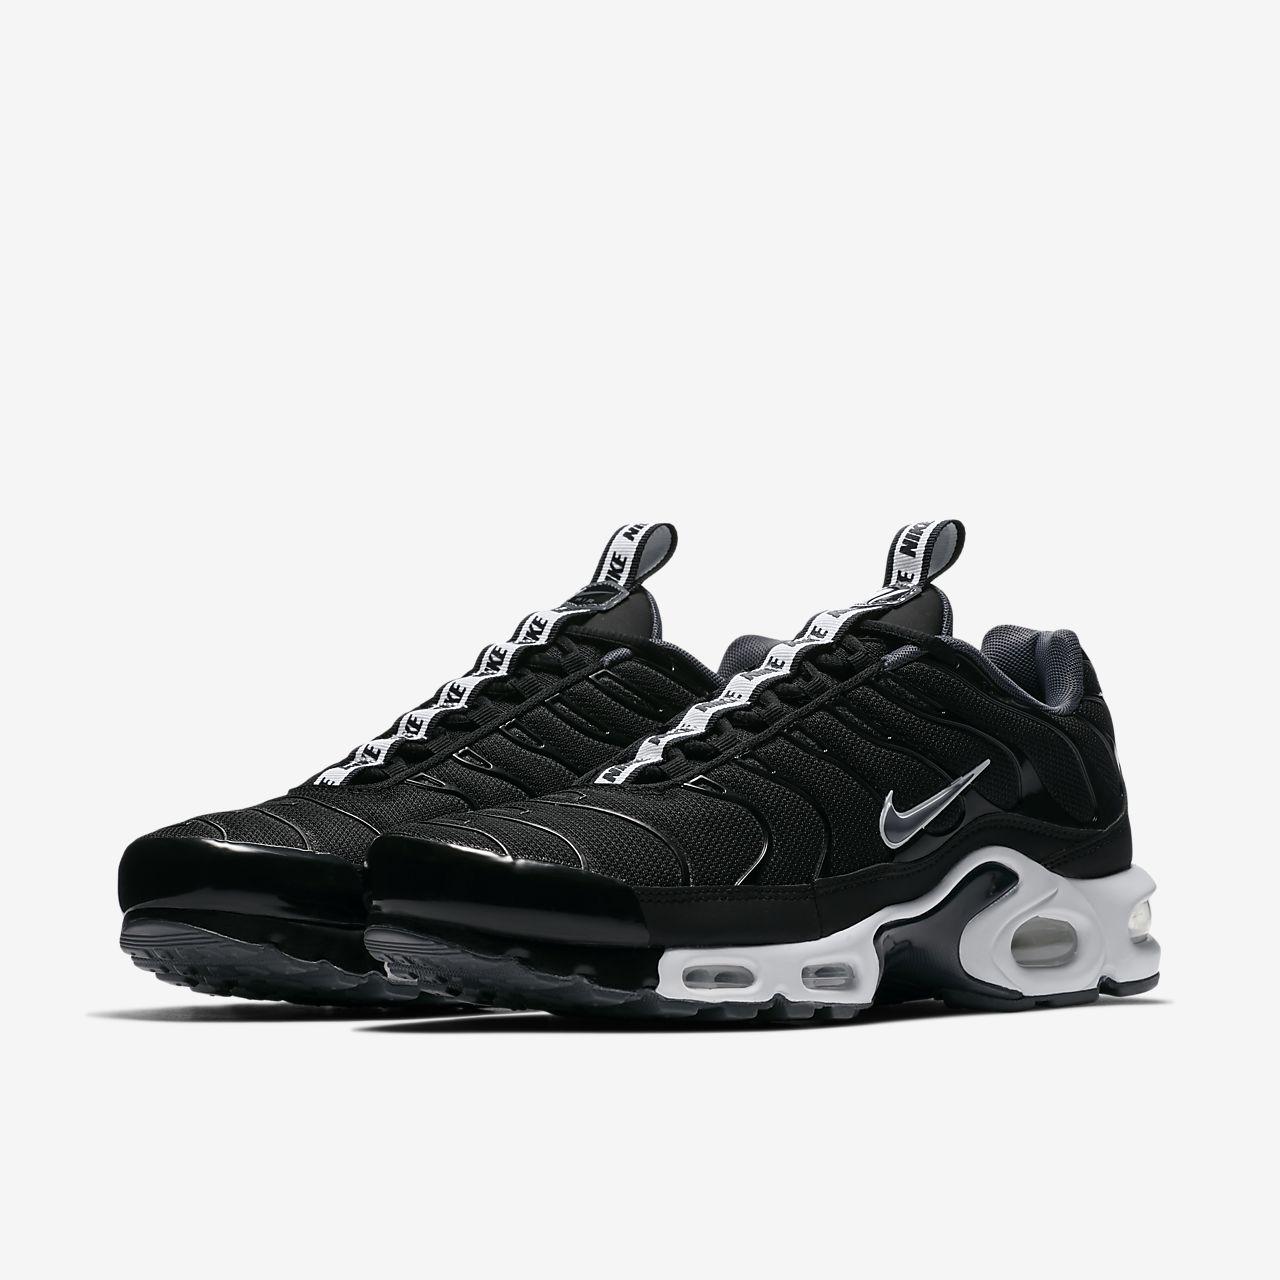 ... Chaussure Nike Air Max Plus TN SE pour Homme